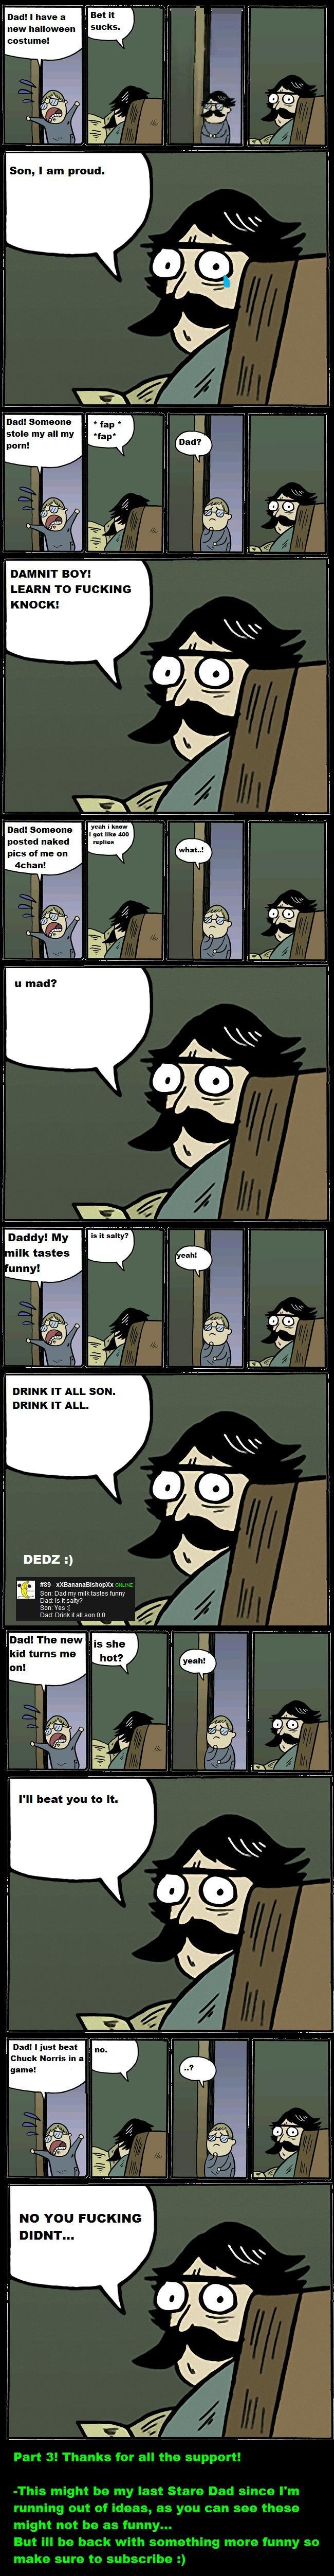 Stare Dad Compilation 3 (Part 4 in desc). Part 4:funnyjunk.com/funny_pictures/1283901/Stare+Dad+Compilation+4/<br /> Funny Stare Dad Comp!:funnyjunk.com/f Stare Dad Compil